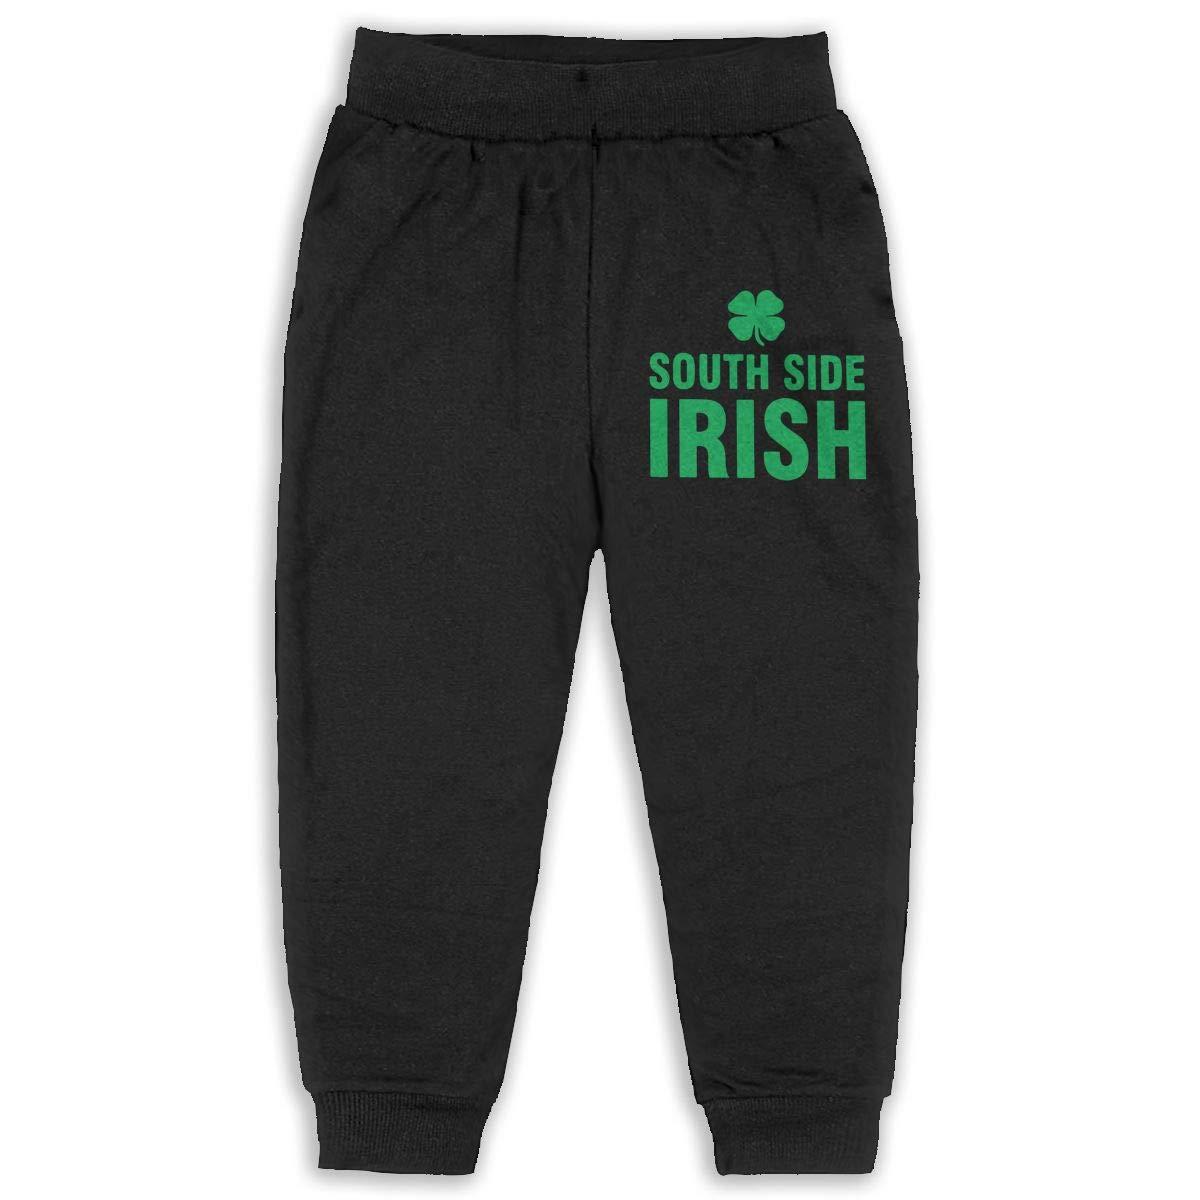 South Side Irish Unisex Kid Toddler Pants Classic Girls Boys Jersey Pant